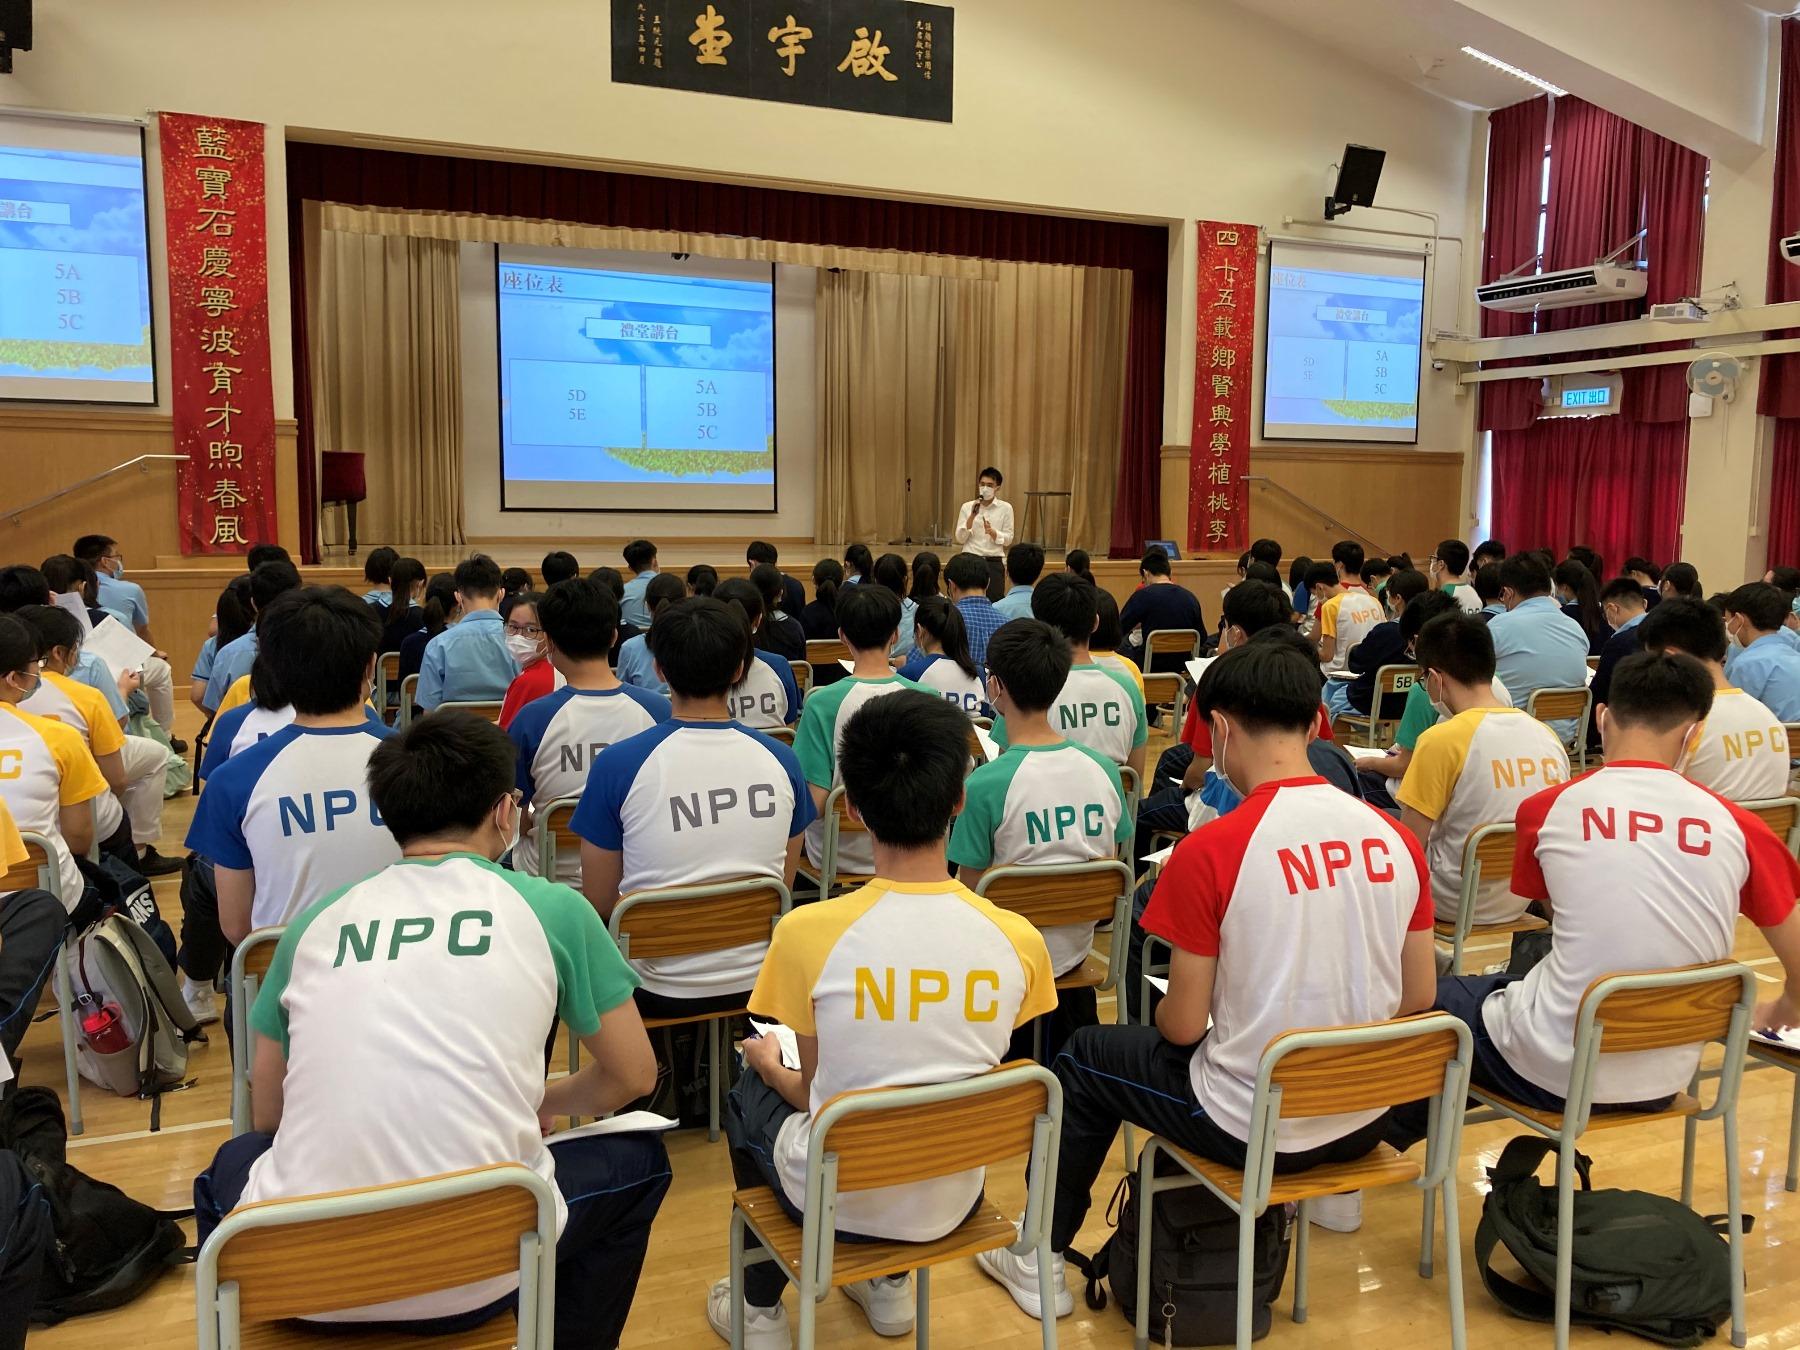 https://npc.edu.hk/sites/default/files/img_9808_2.jpg